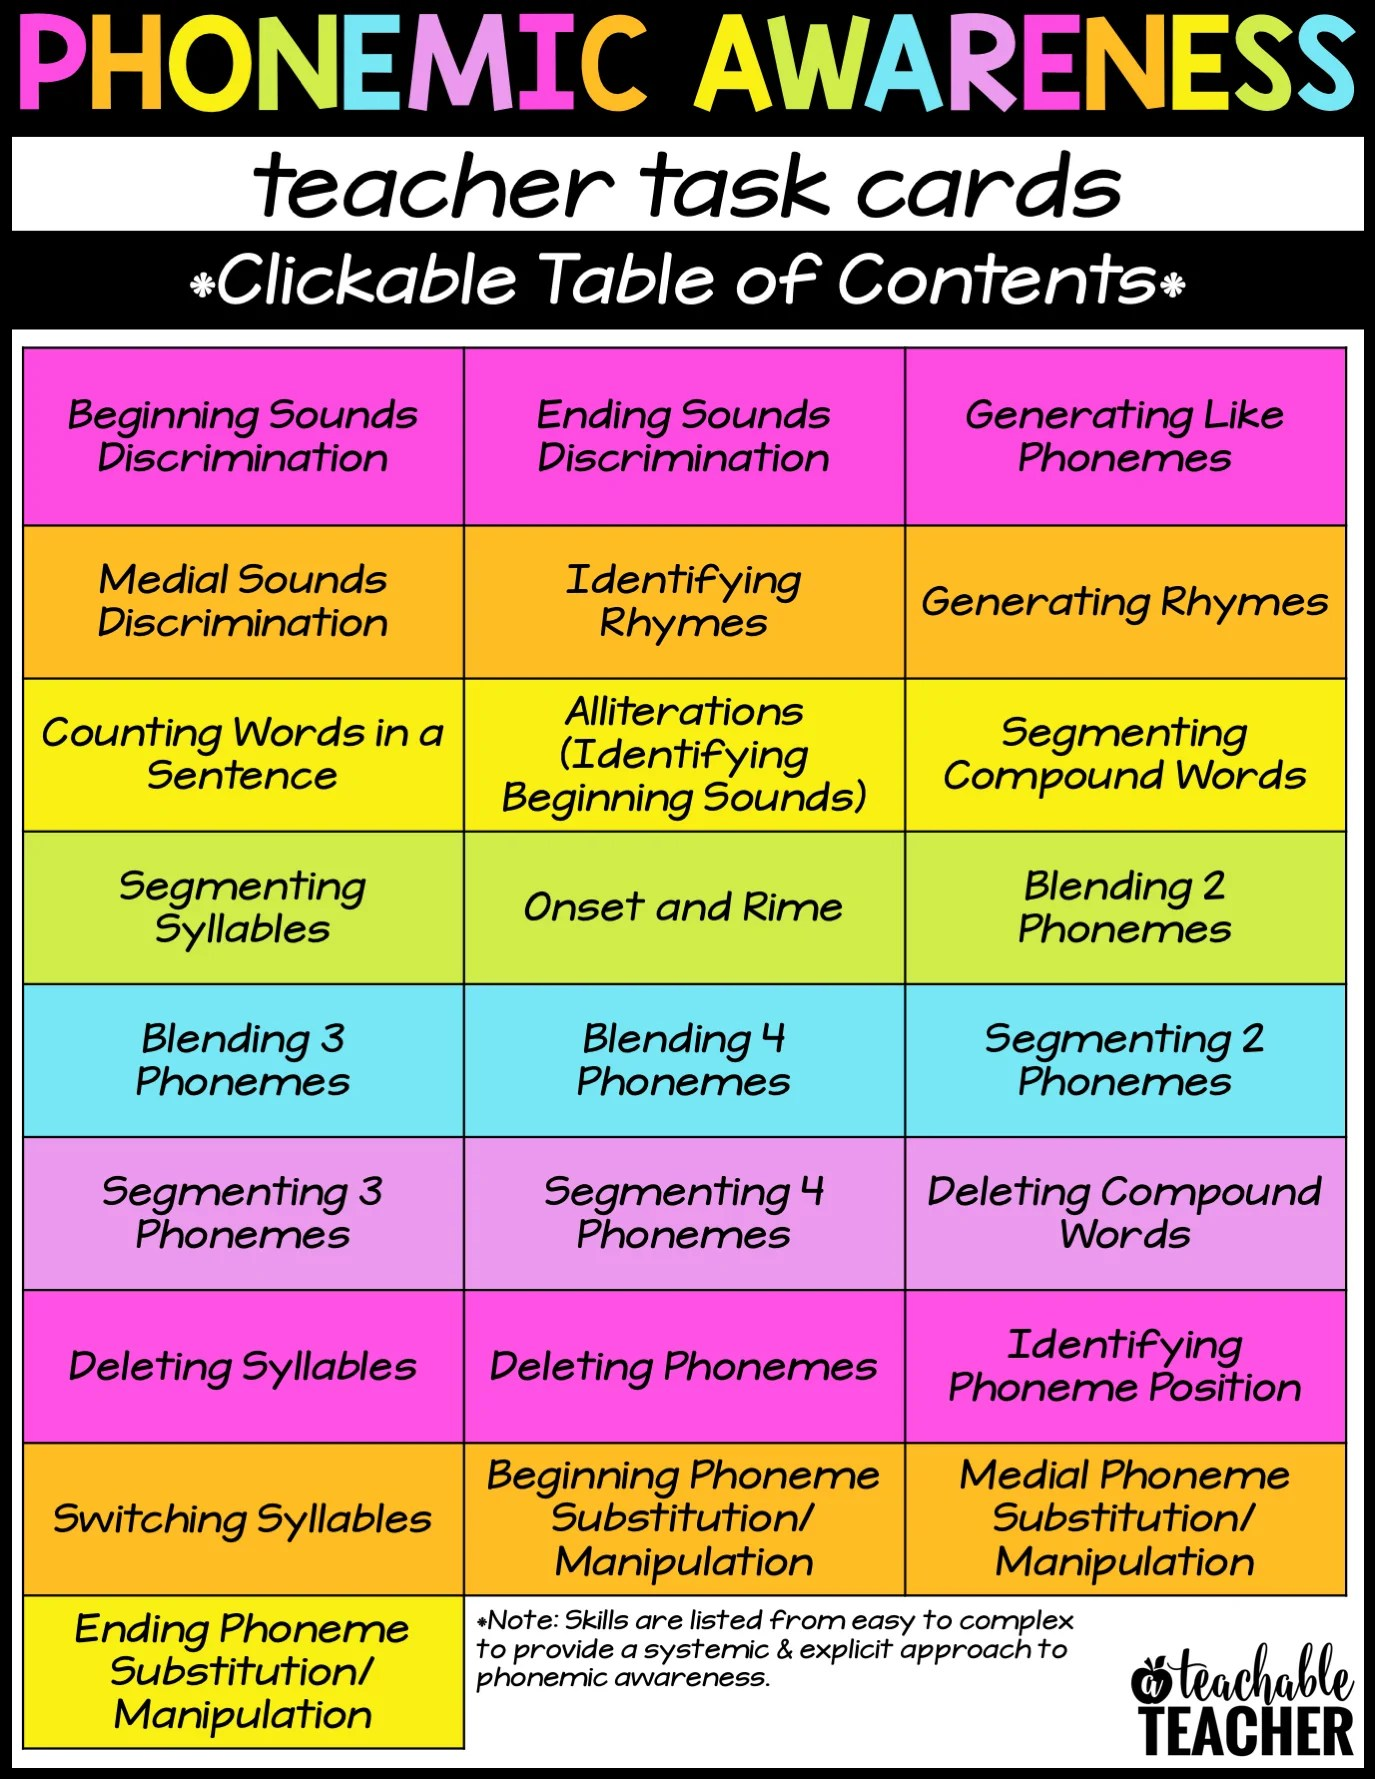 hight resolution of Phonemic Awareness Teacher Task Cards - A Teachable Teacher